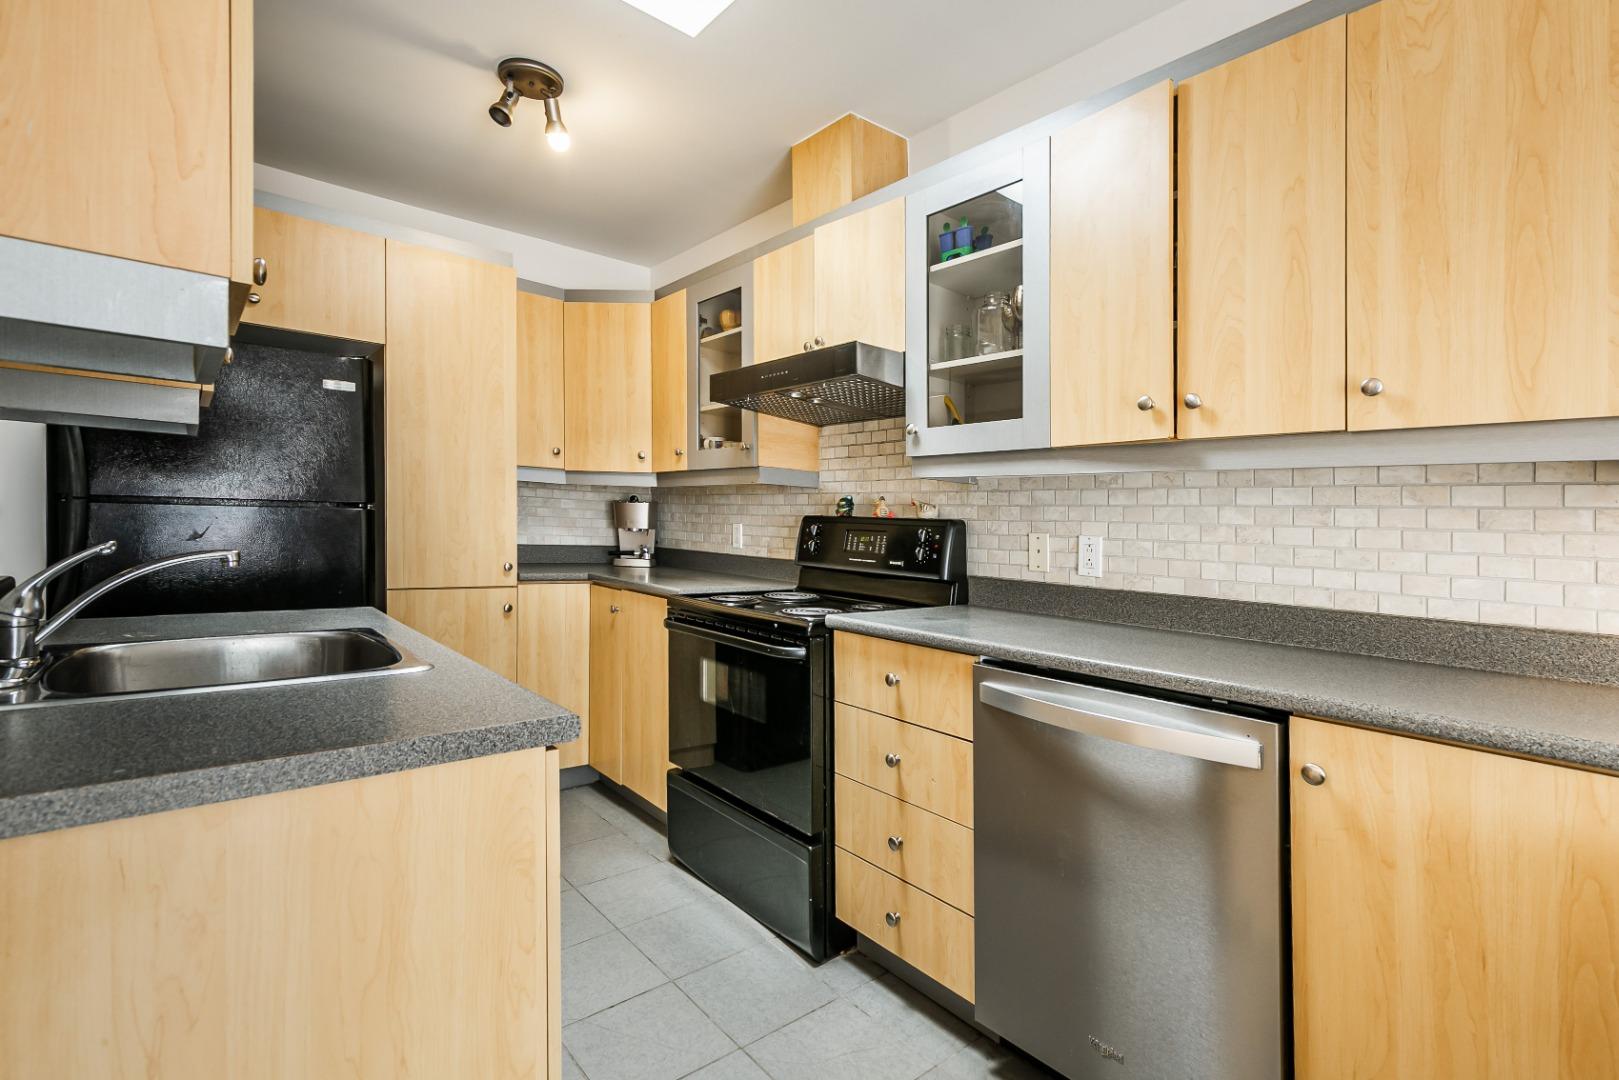 Condo à vendre Villeray 7547 Rue Lajeunesse (7).jpg